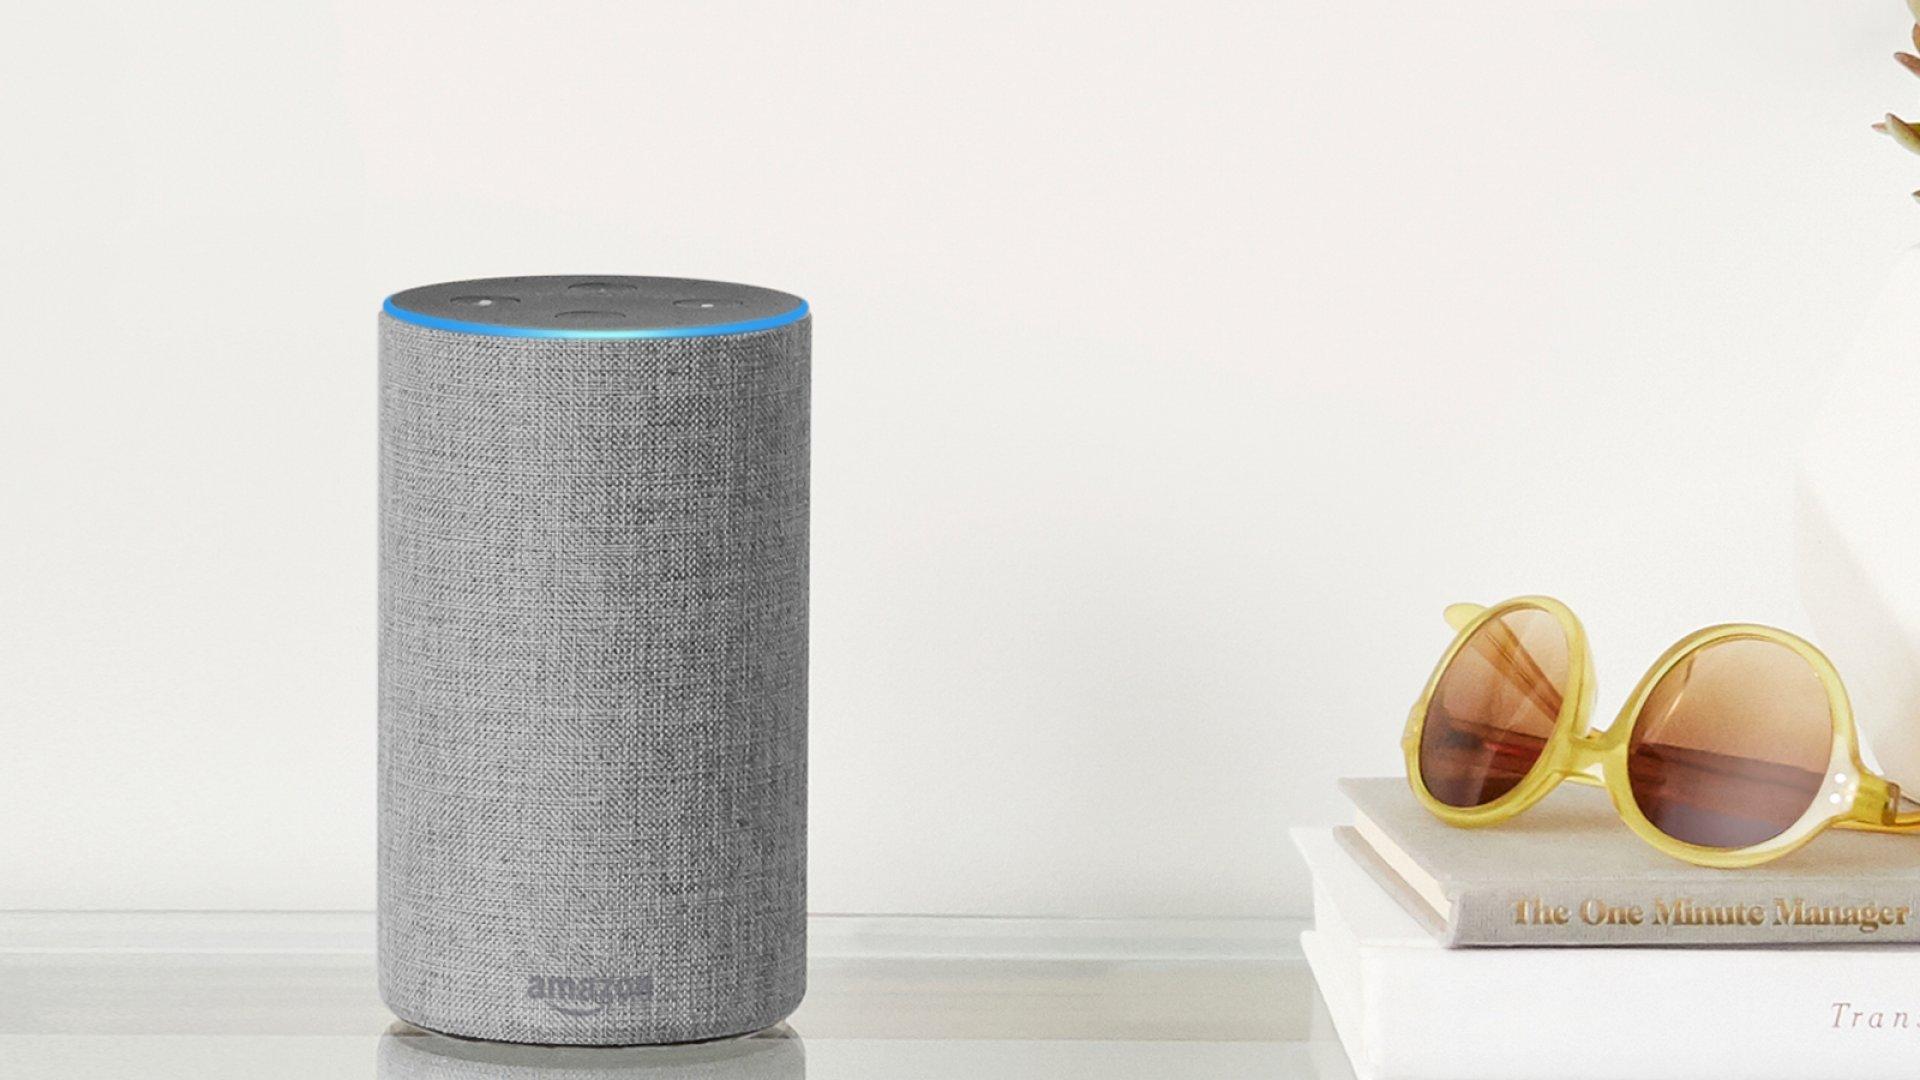 7 Really Unusual But Useful Add-ons for Amazon Alexa